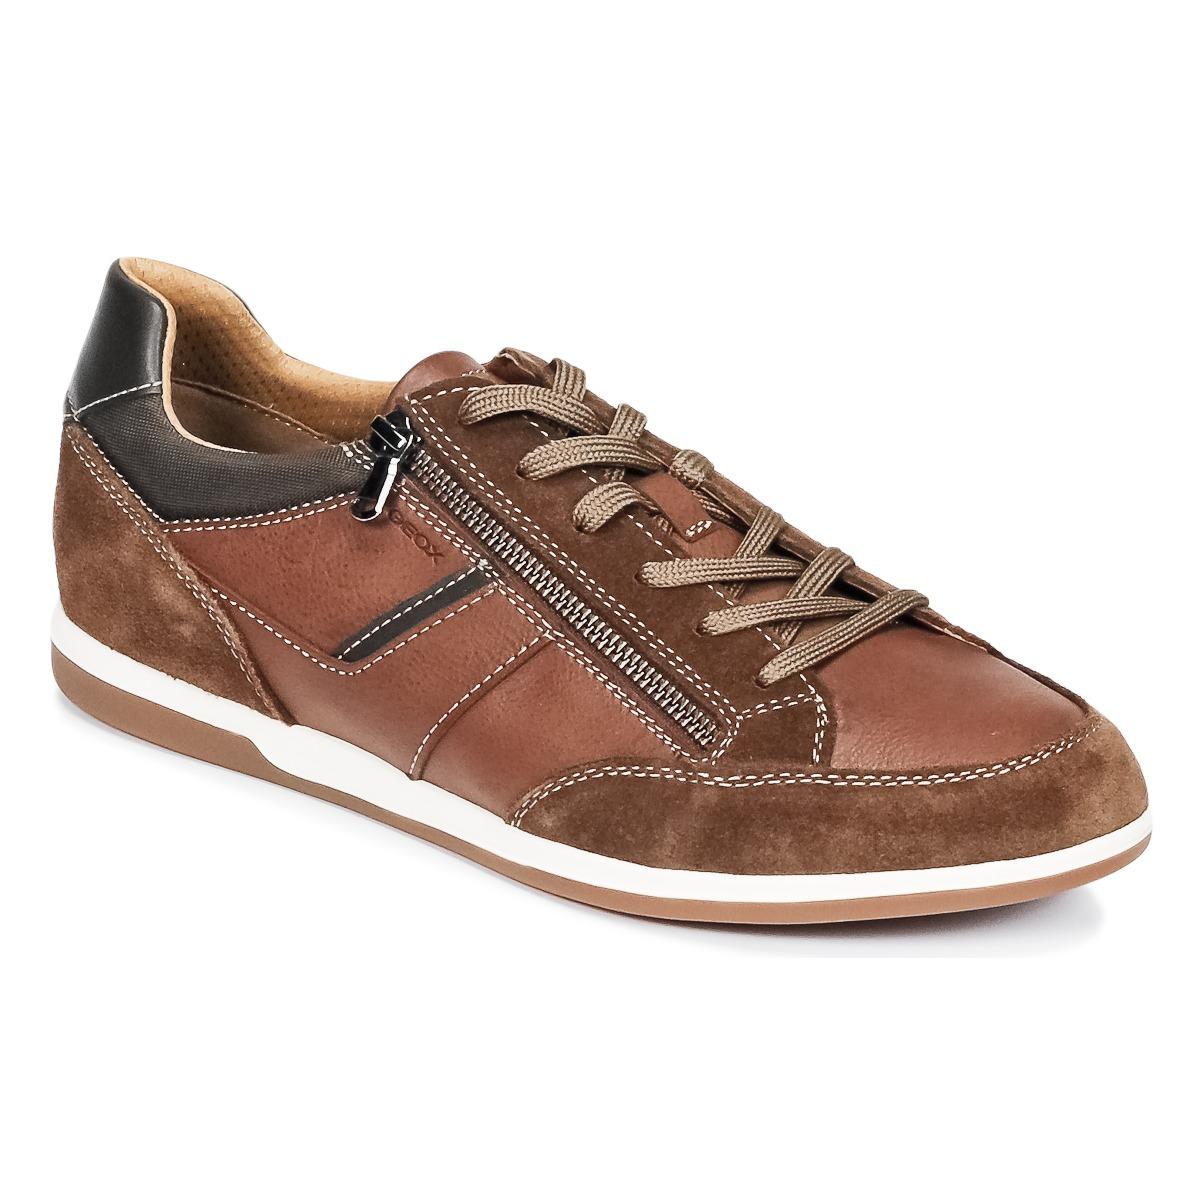 Geox U RENAN C Braun - Kostenloser Versand bei Spartoode ! - Schuhe Sneaker Low Herren 79,99 €